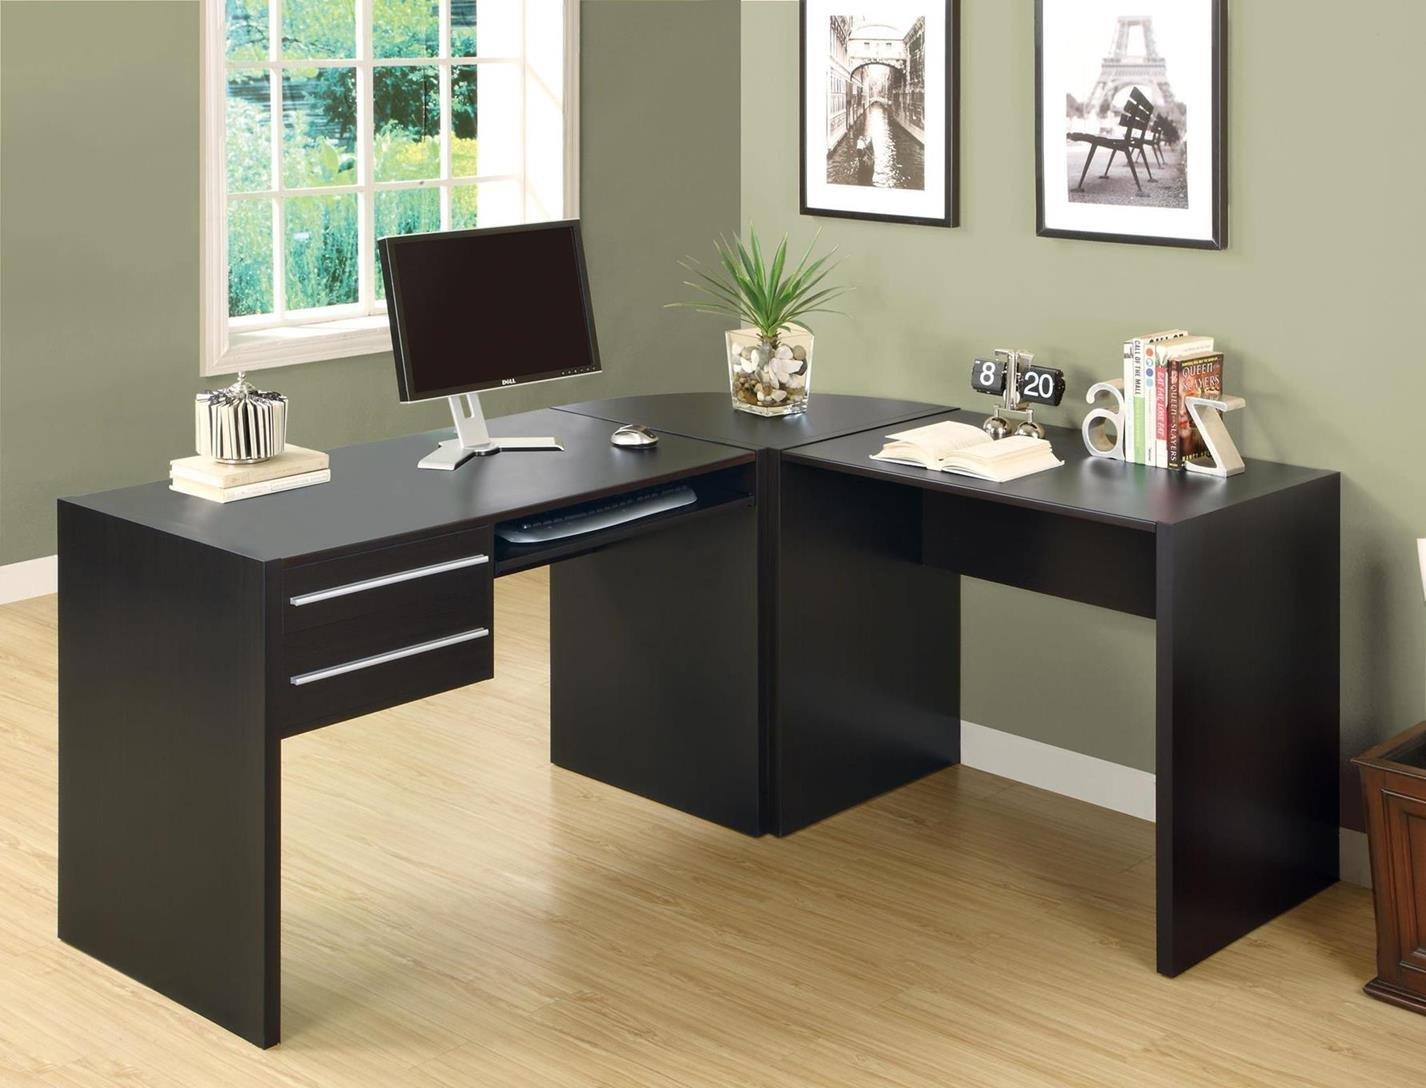 images com monarch computer specialties in hayneedle from desks contemporary pinterest on corner best office desk